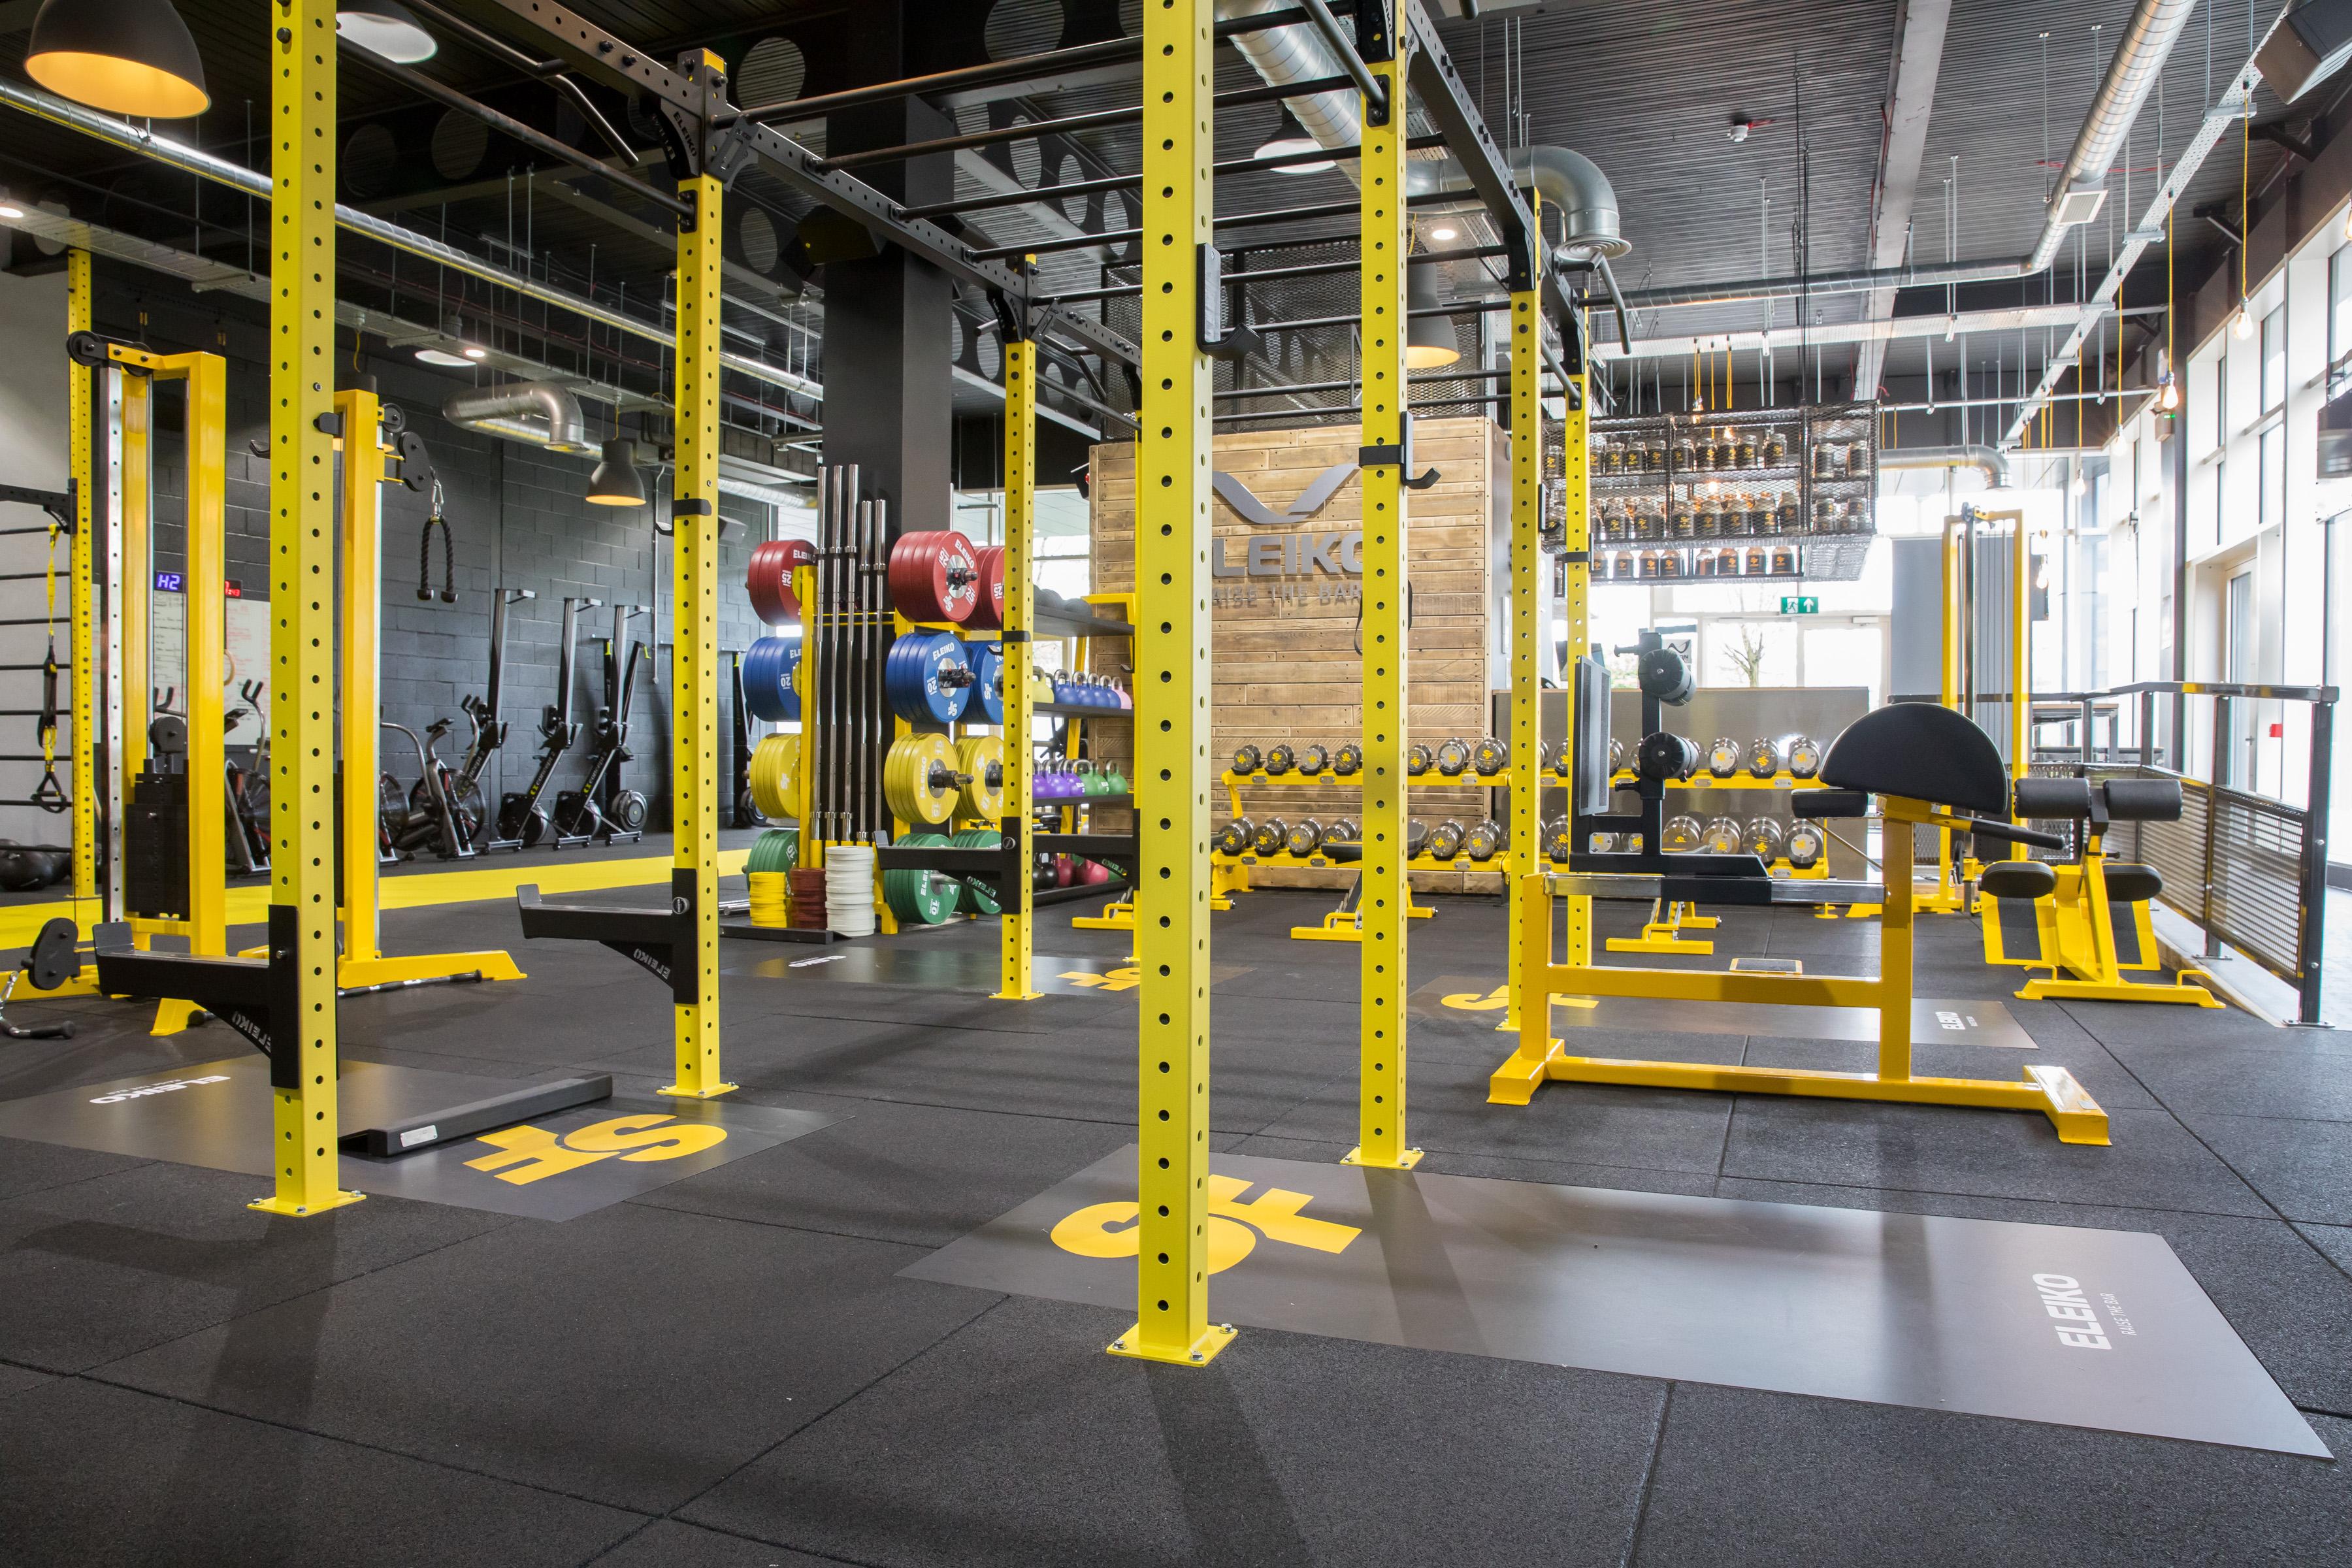 starks-fitness-gym-equipment